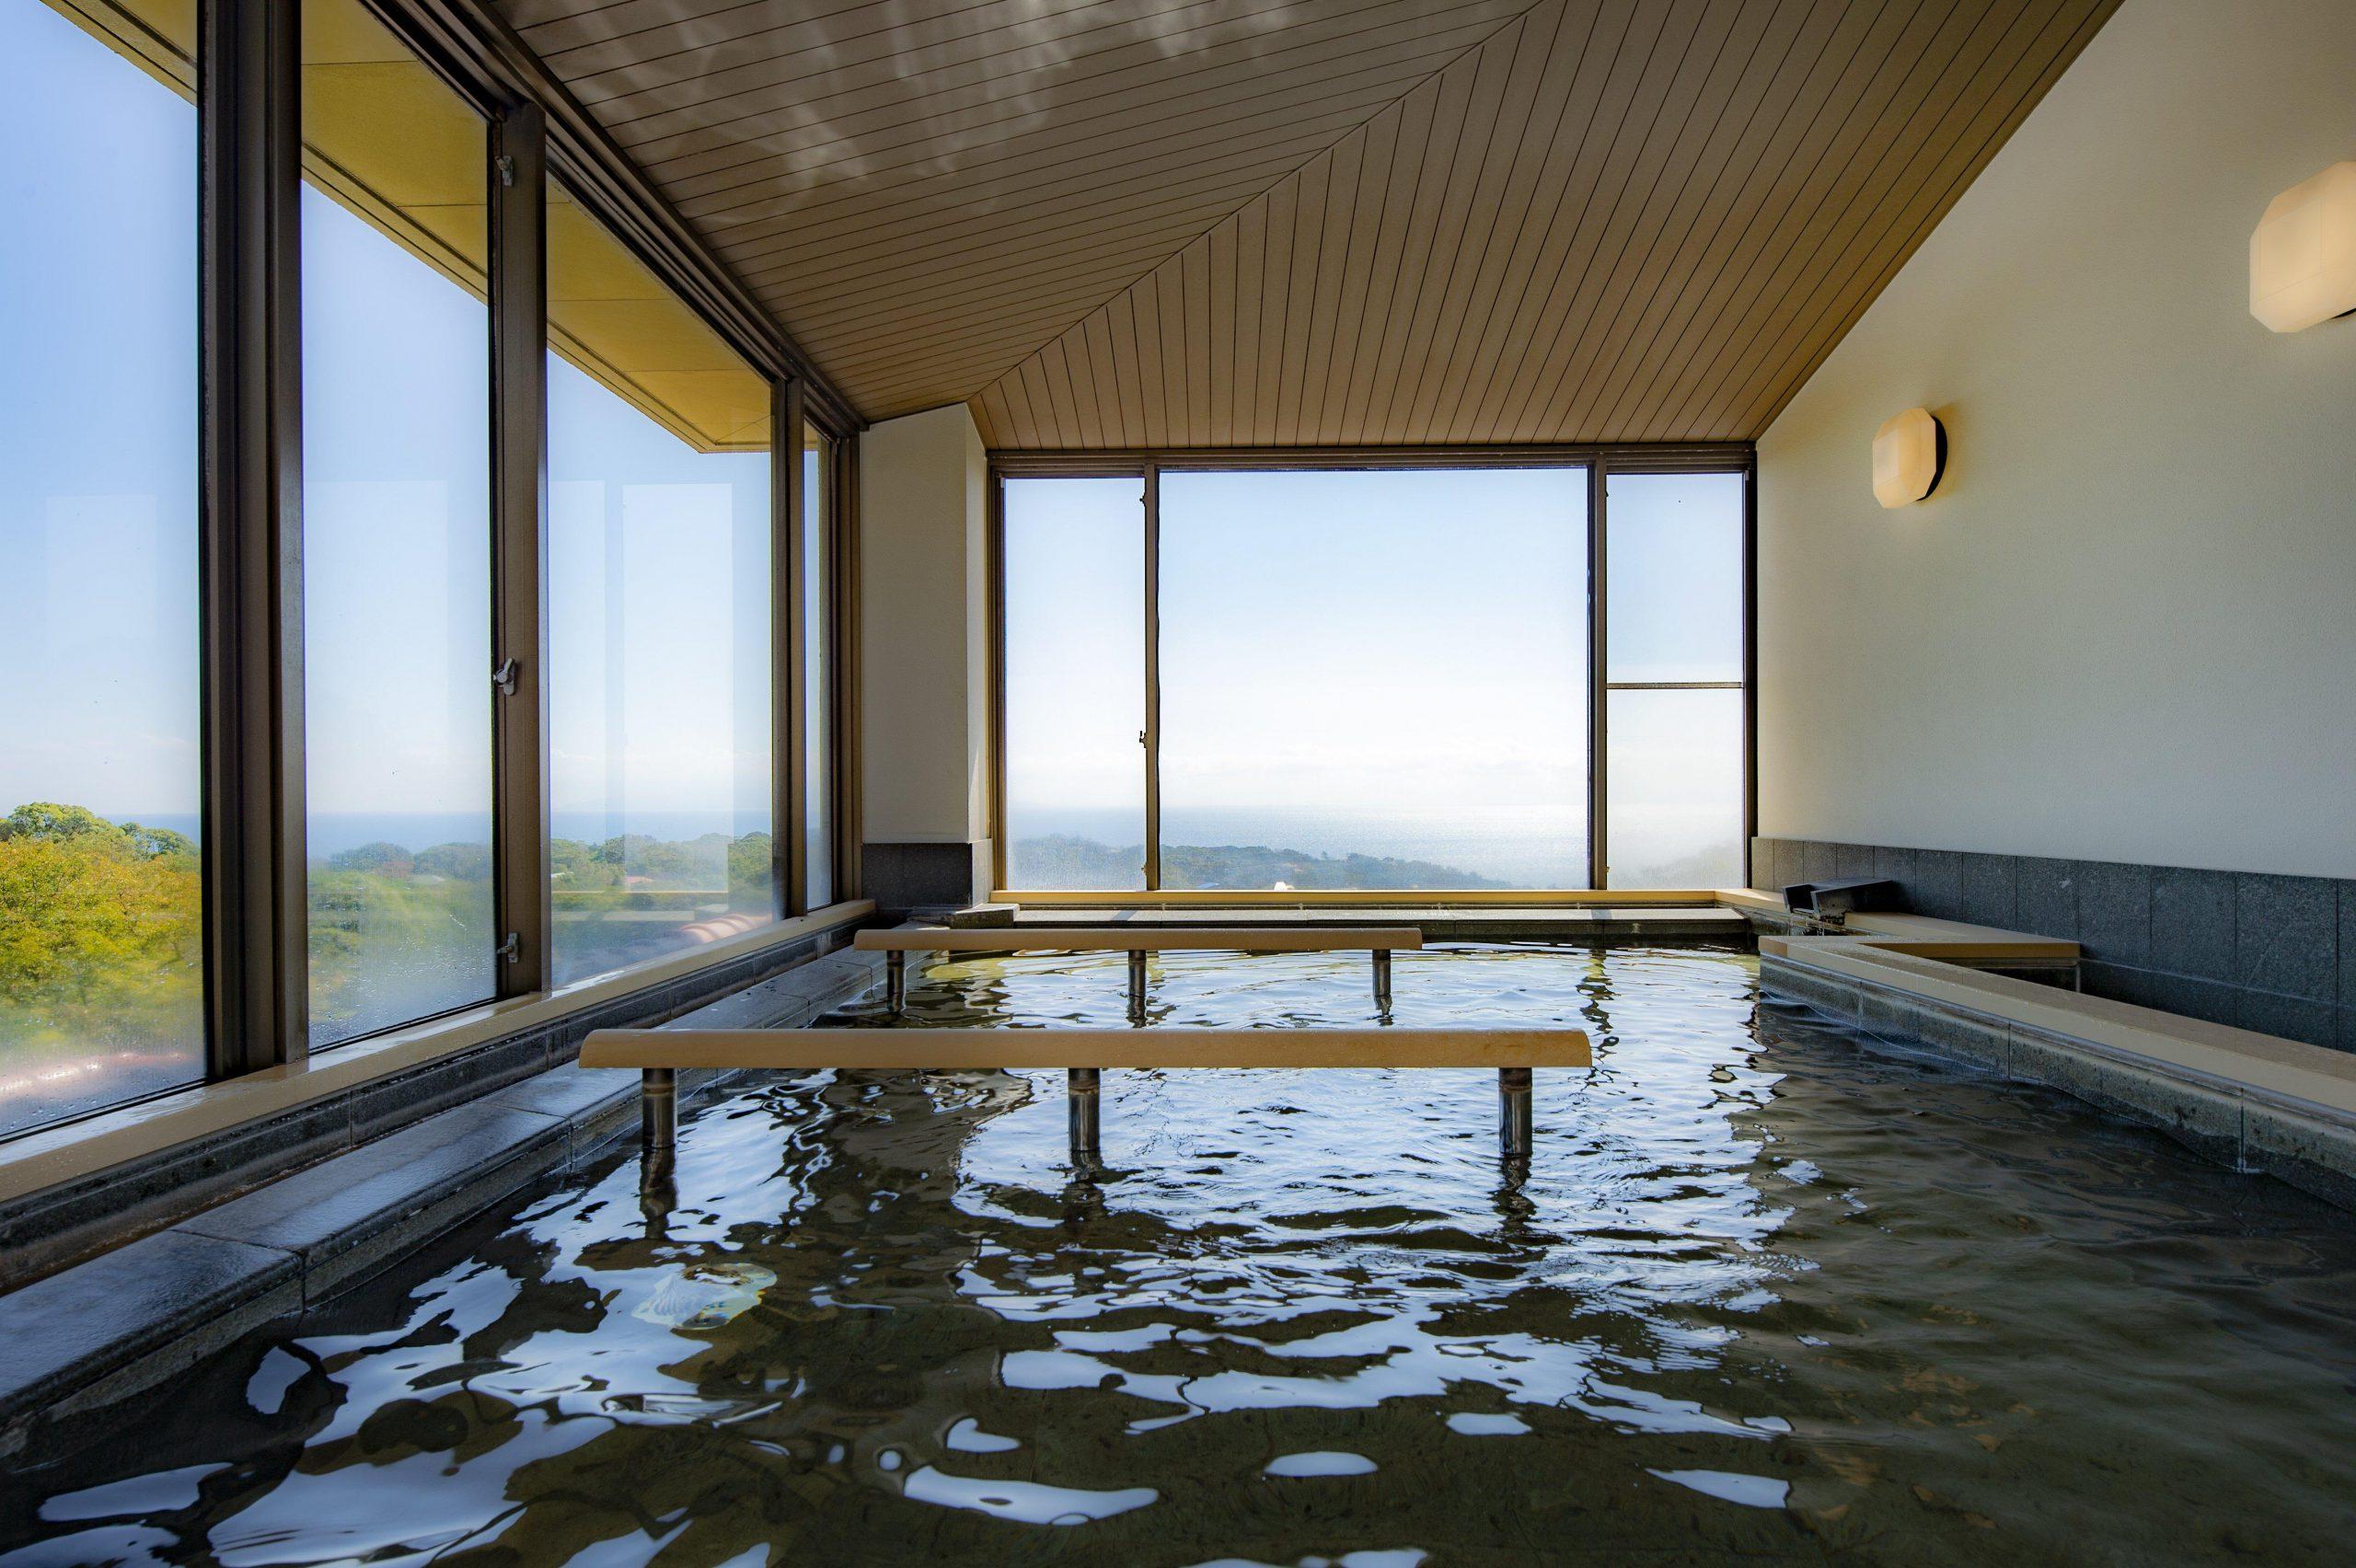 Wan's Resort(ワンズリゾート)城ヶ崎海岸(伊豆高原)